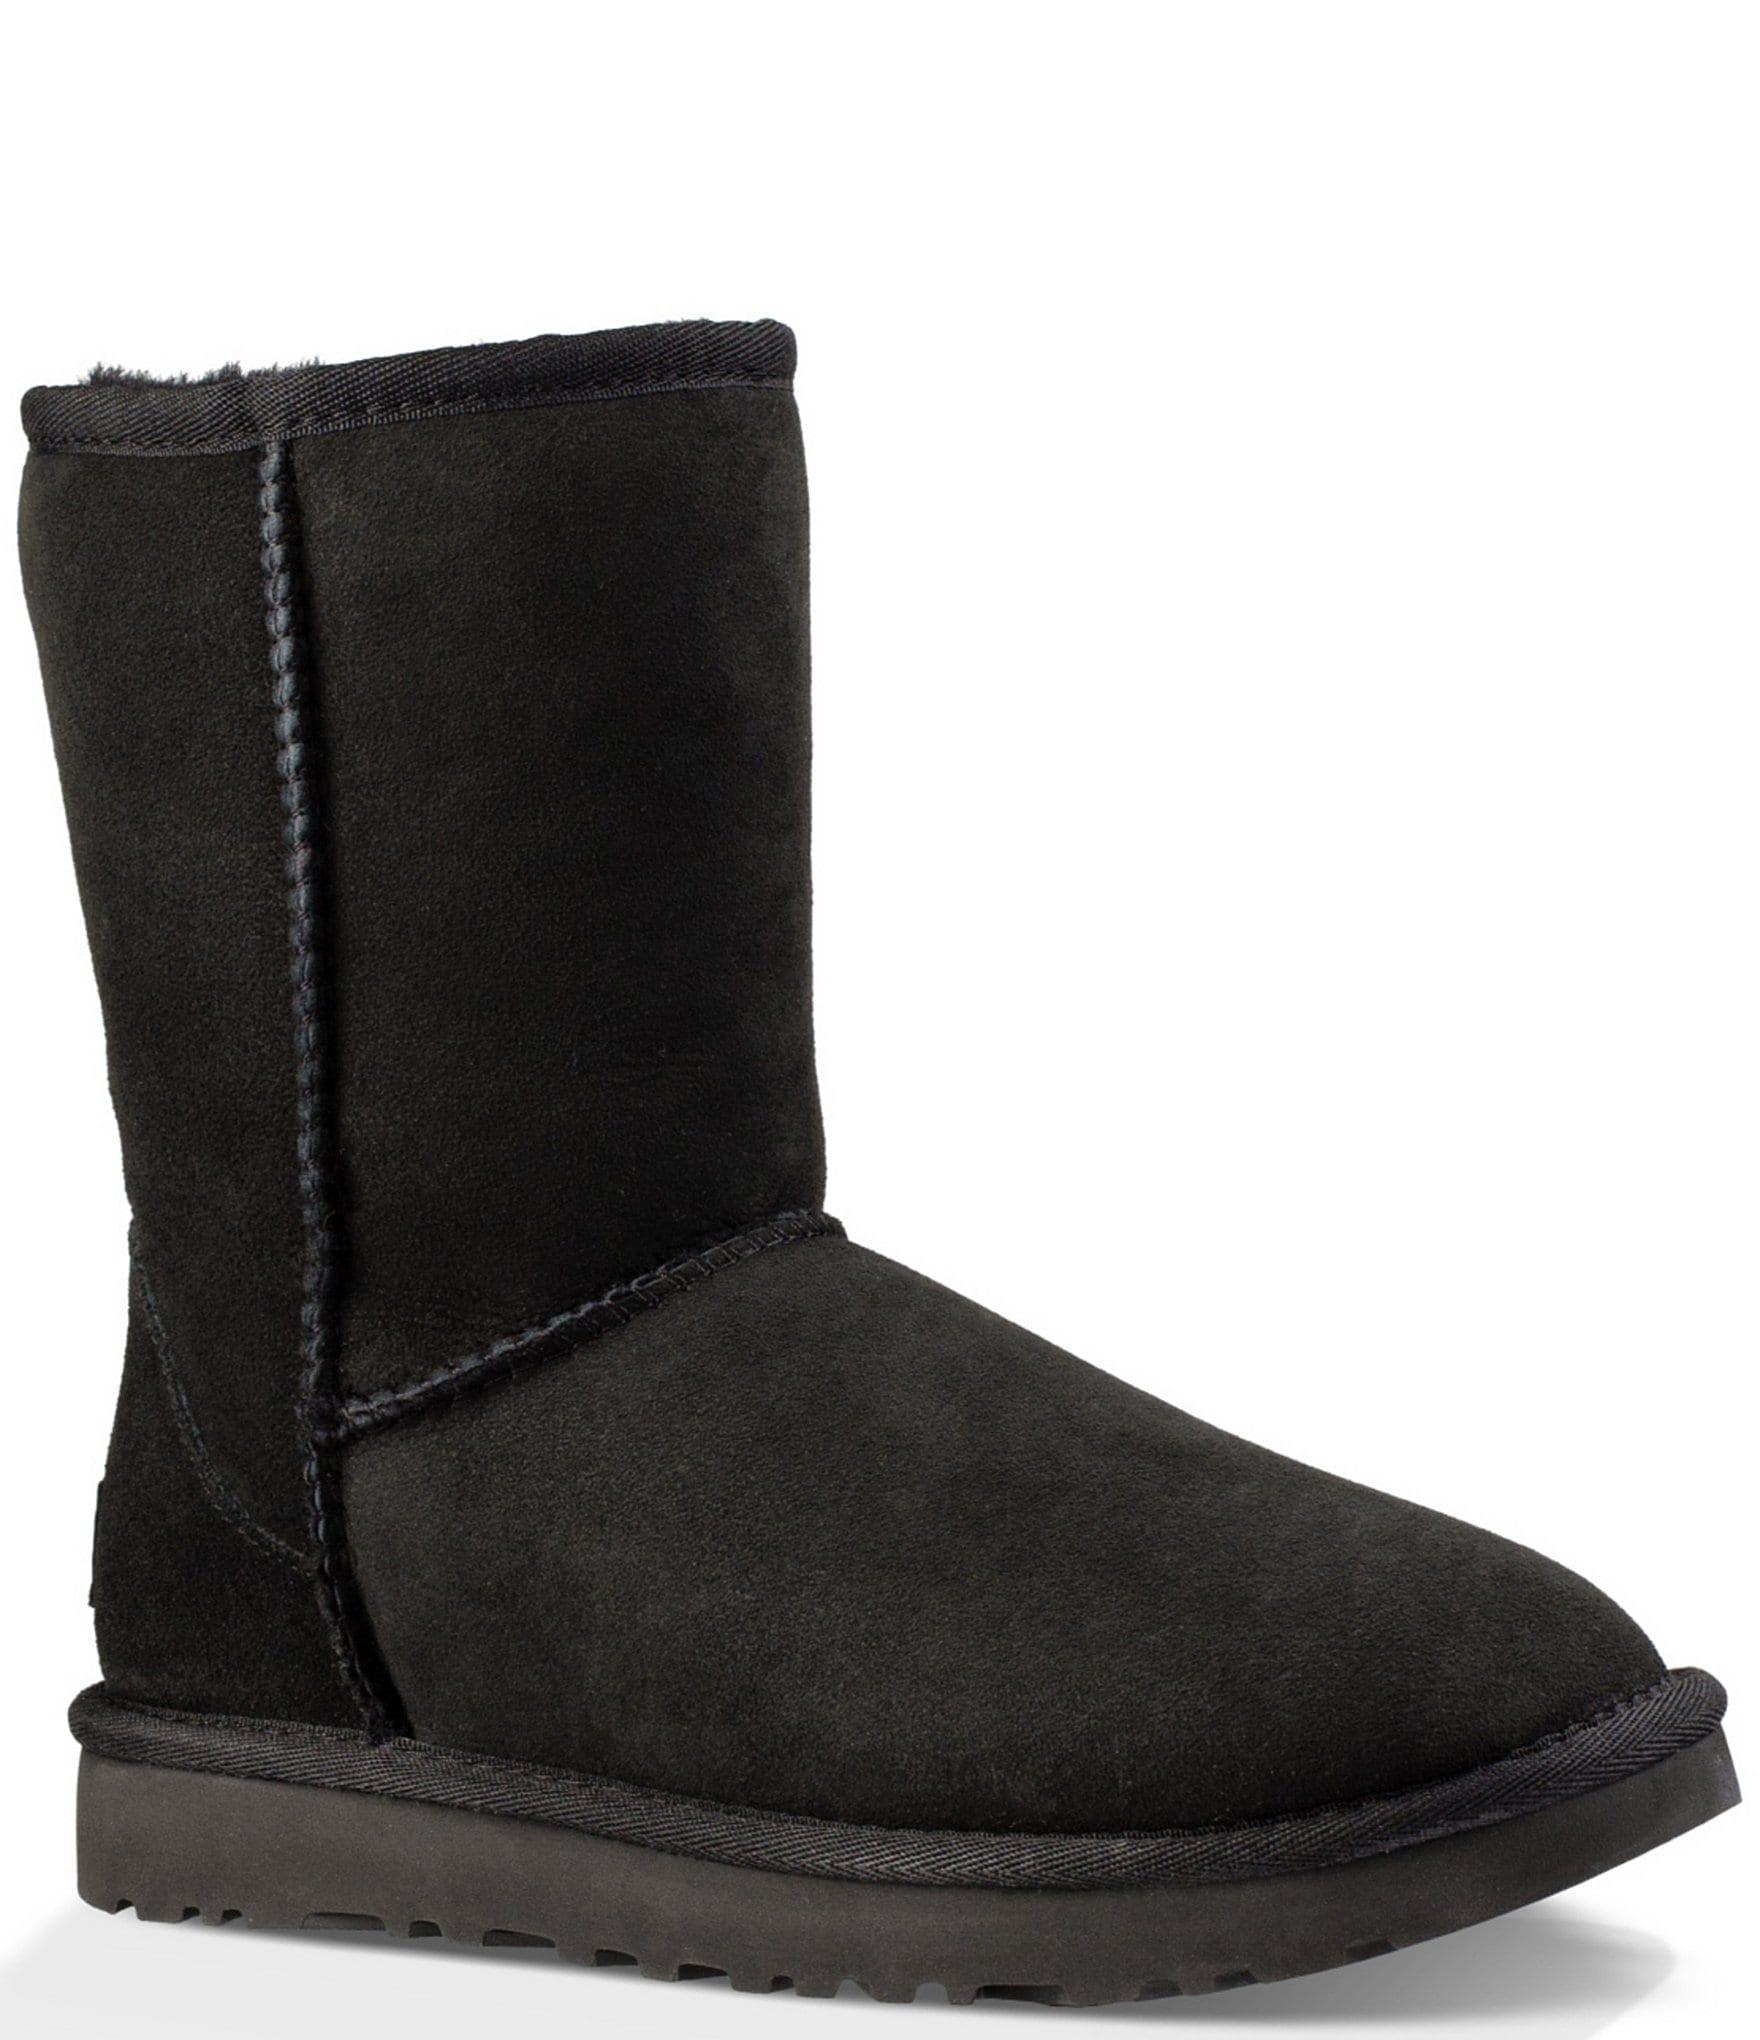 06187e2f826 UGG® Classic Short II Suede Boots